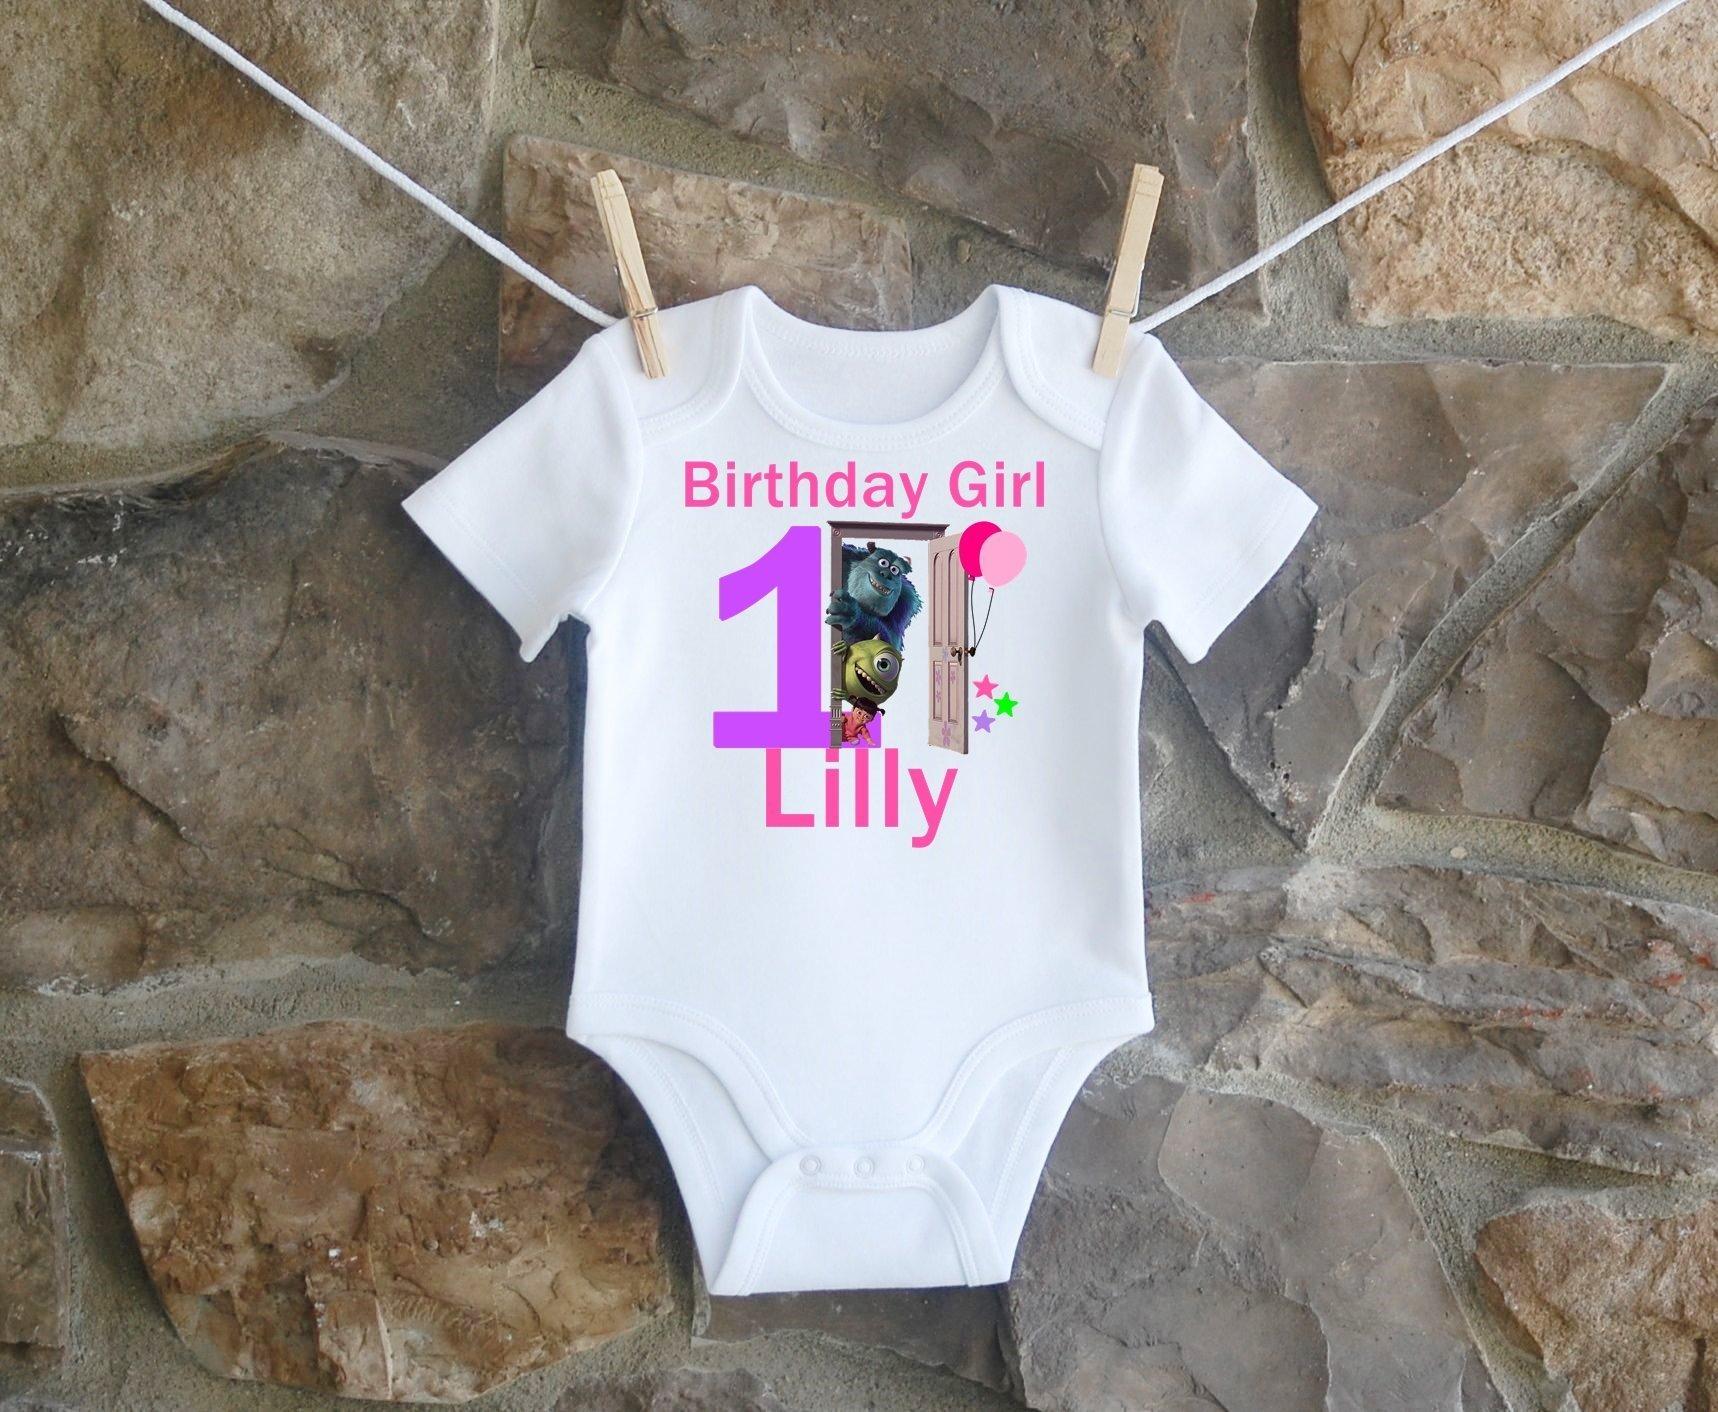 Monsters Inc. Birthday Shirt, Monsters Inc. Birthday Shirt For Girls, Personalized Girls Monsters Inc. Birthday Shirt, Customized Monsters Inc. Birthday Shirt